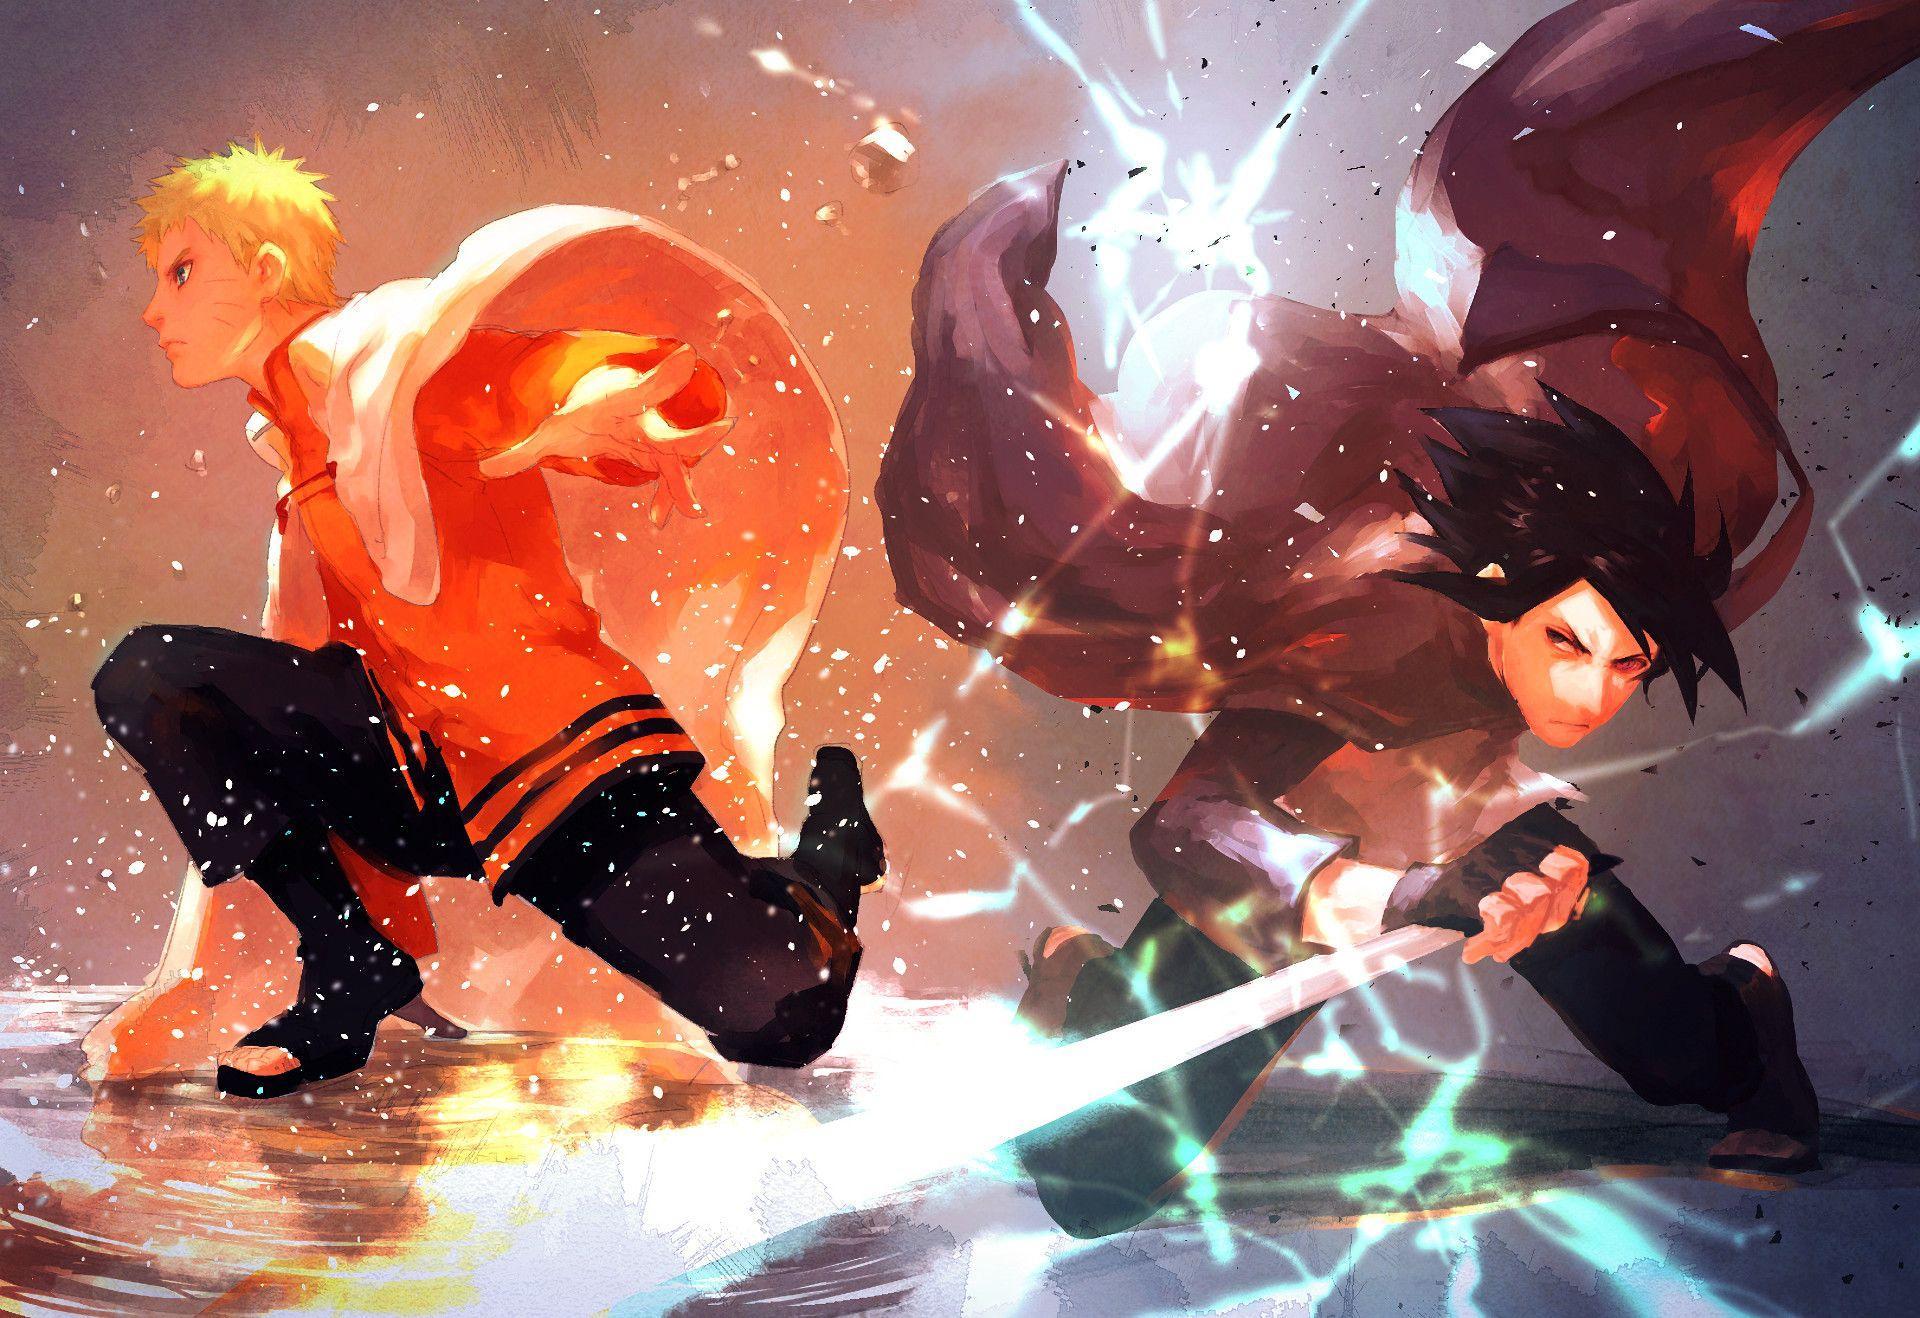 Boruto And Naruto Wallpapers Top Free Boruto And Naruto Backgrounds Wallpaperaccess